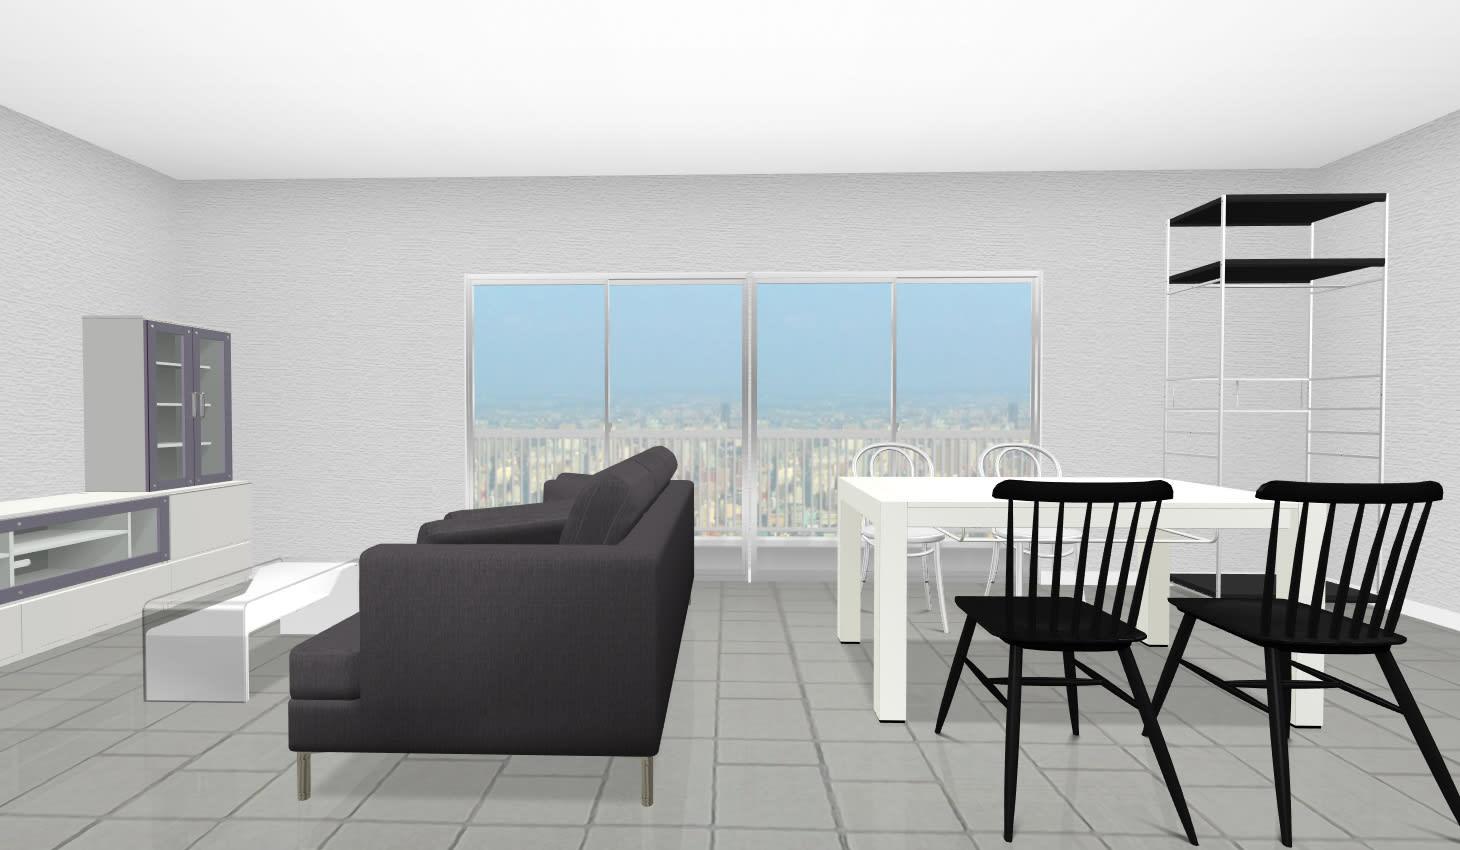 STEP. 3|部屋のイメージを全体で確認